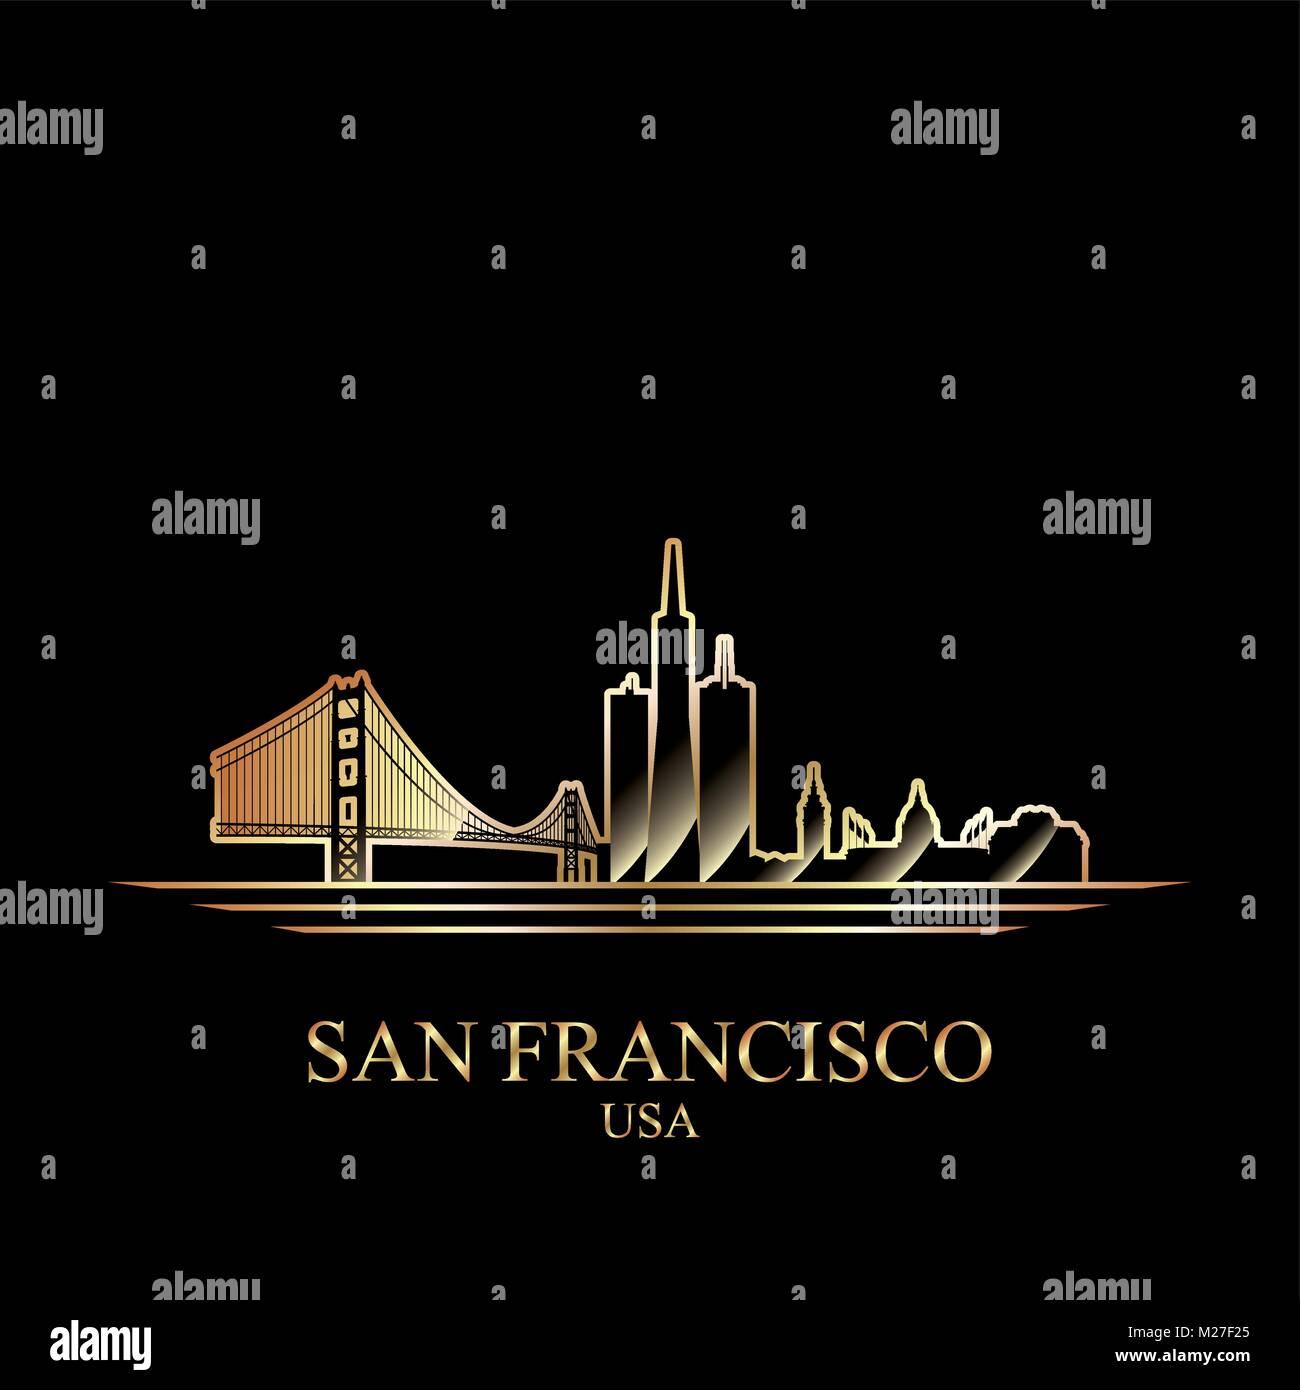 Silueta de oro de San Francisco, sobre fondo negro, ilustración vectorial Imagen De Stock